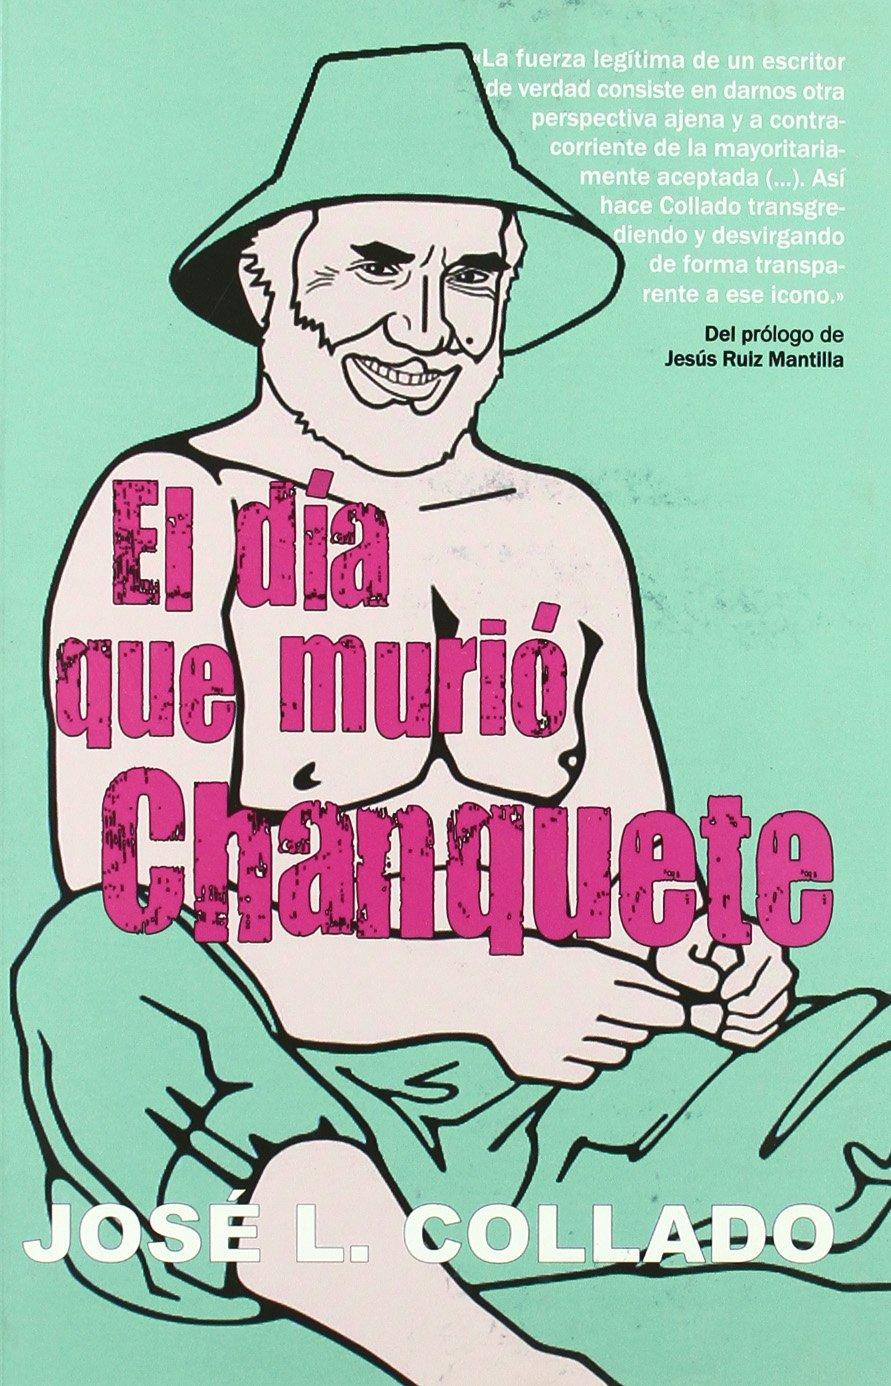 El Día Que Murió Chanquete (Spanish Edition) (Spanish) Paperback – May 30, 2007